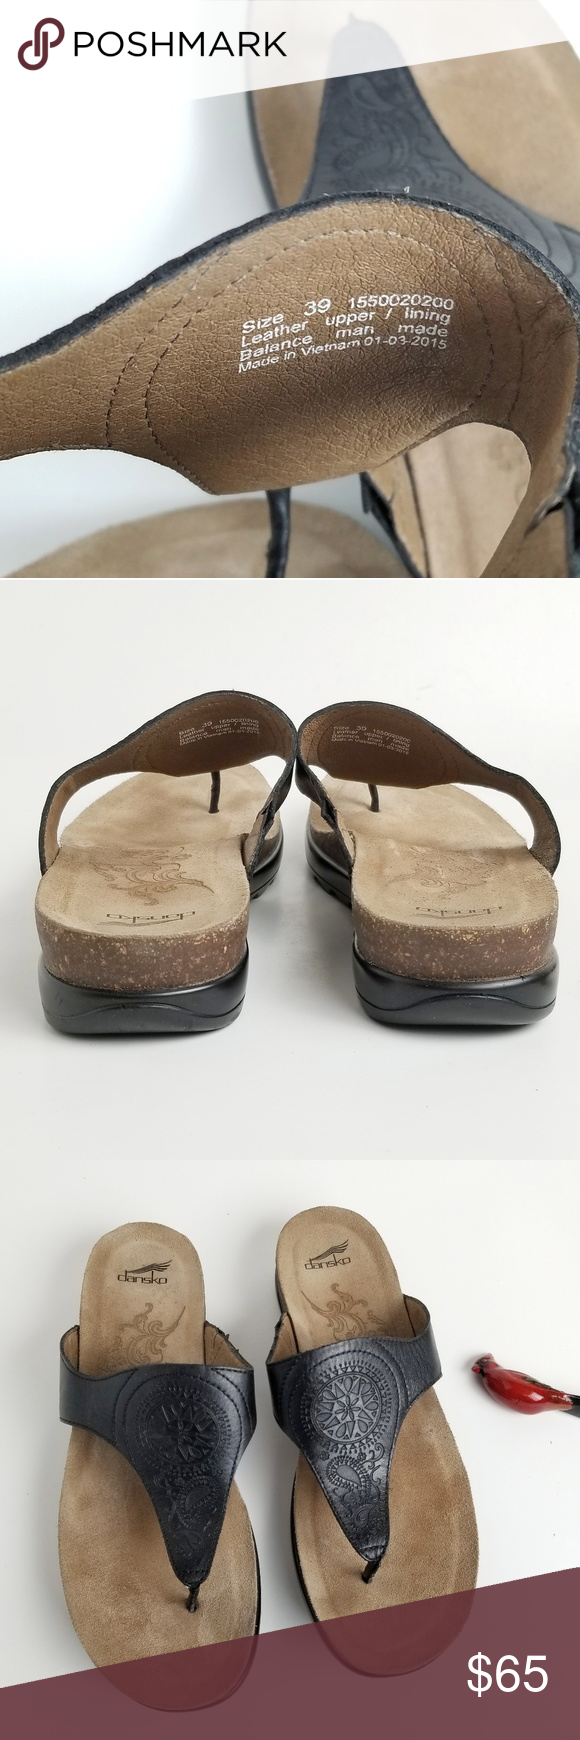 f2ce55668d7f Dansko Priya black leather thong sandals size9 women s Dansko Priya sandals  confort and casual in veg